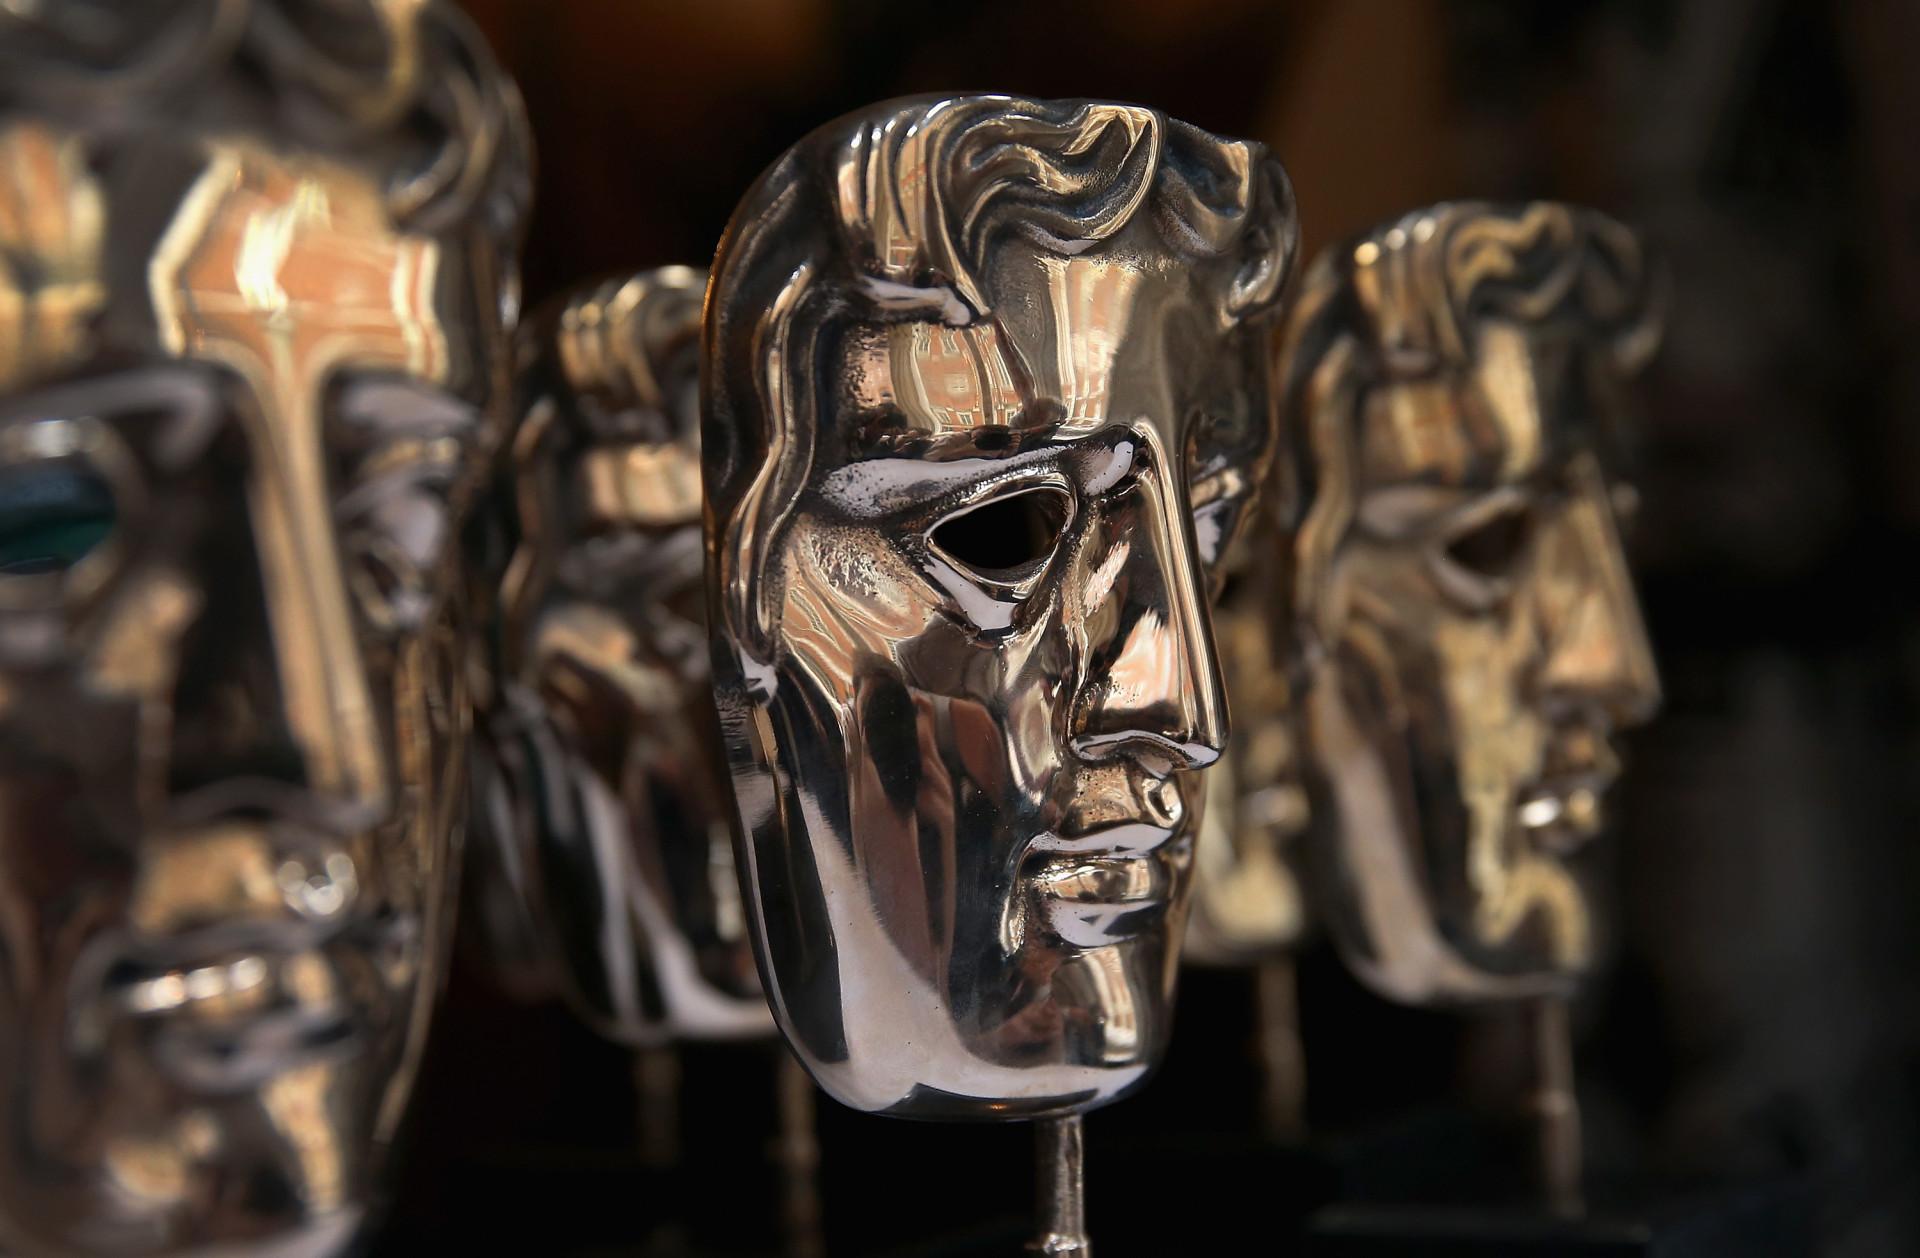 The LGBT wins at the 2019 BAFTA Awards